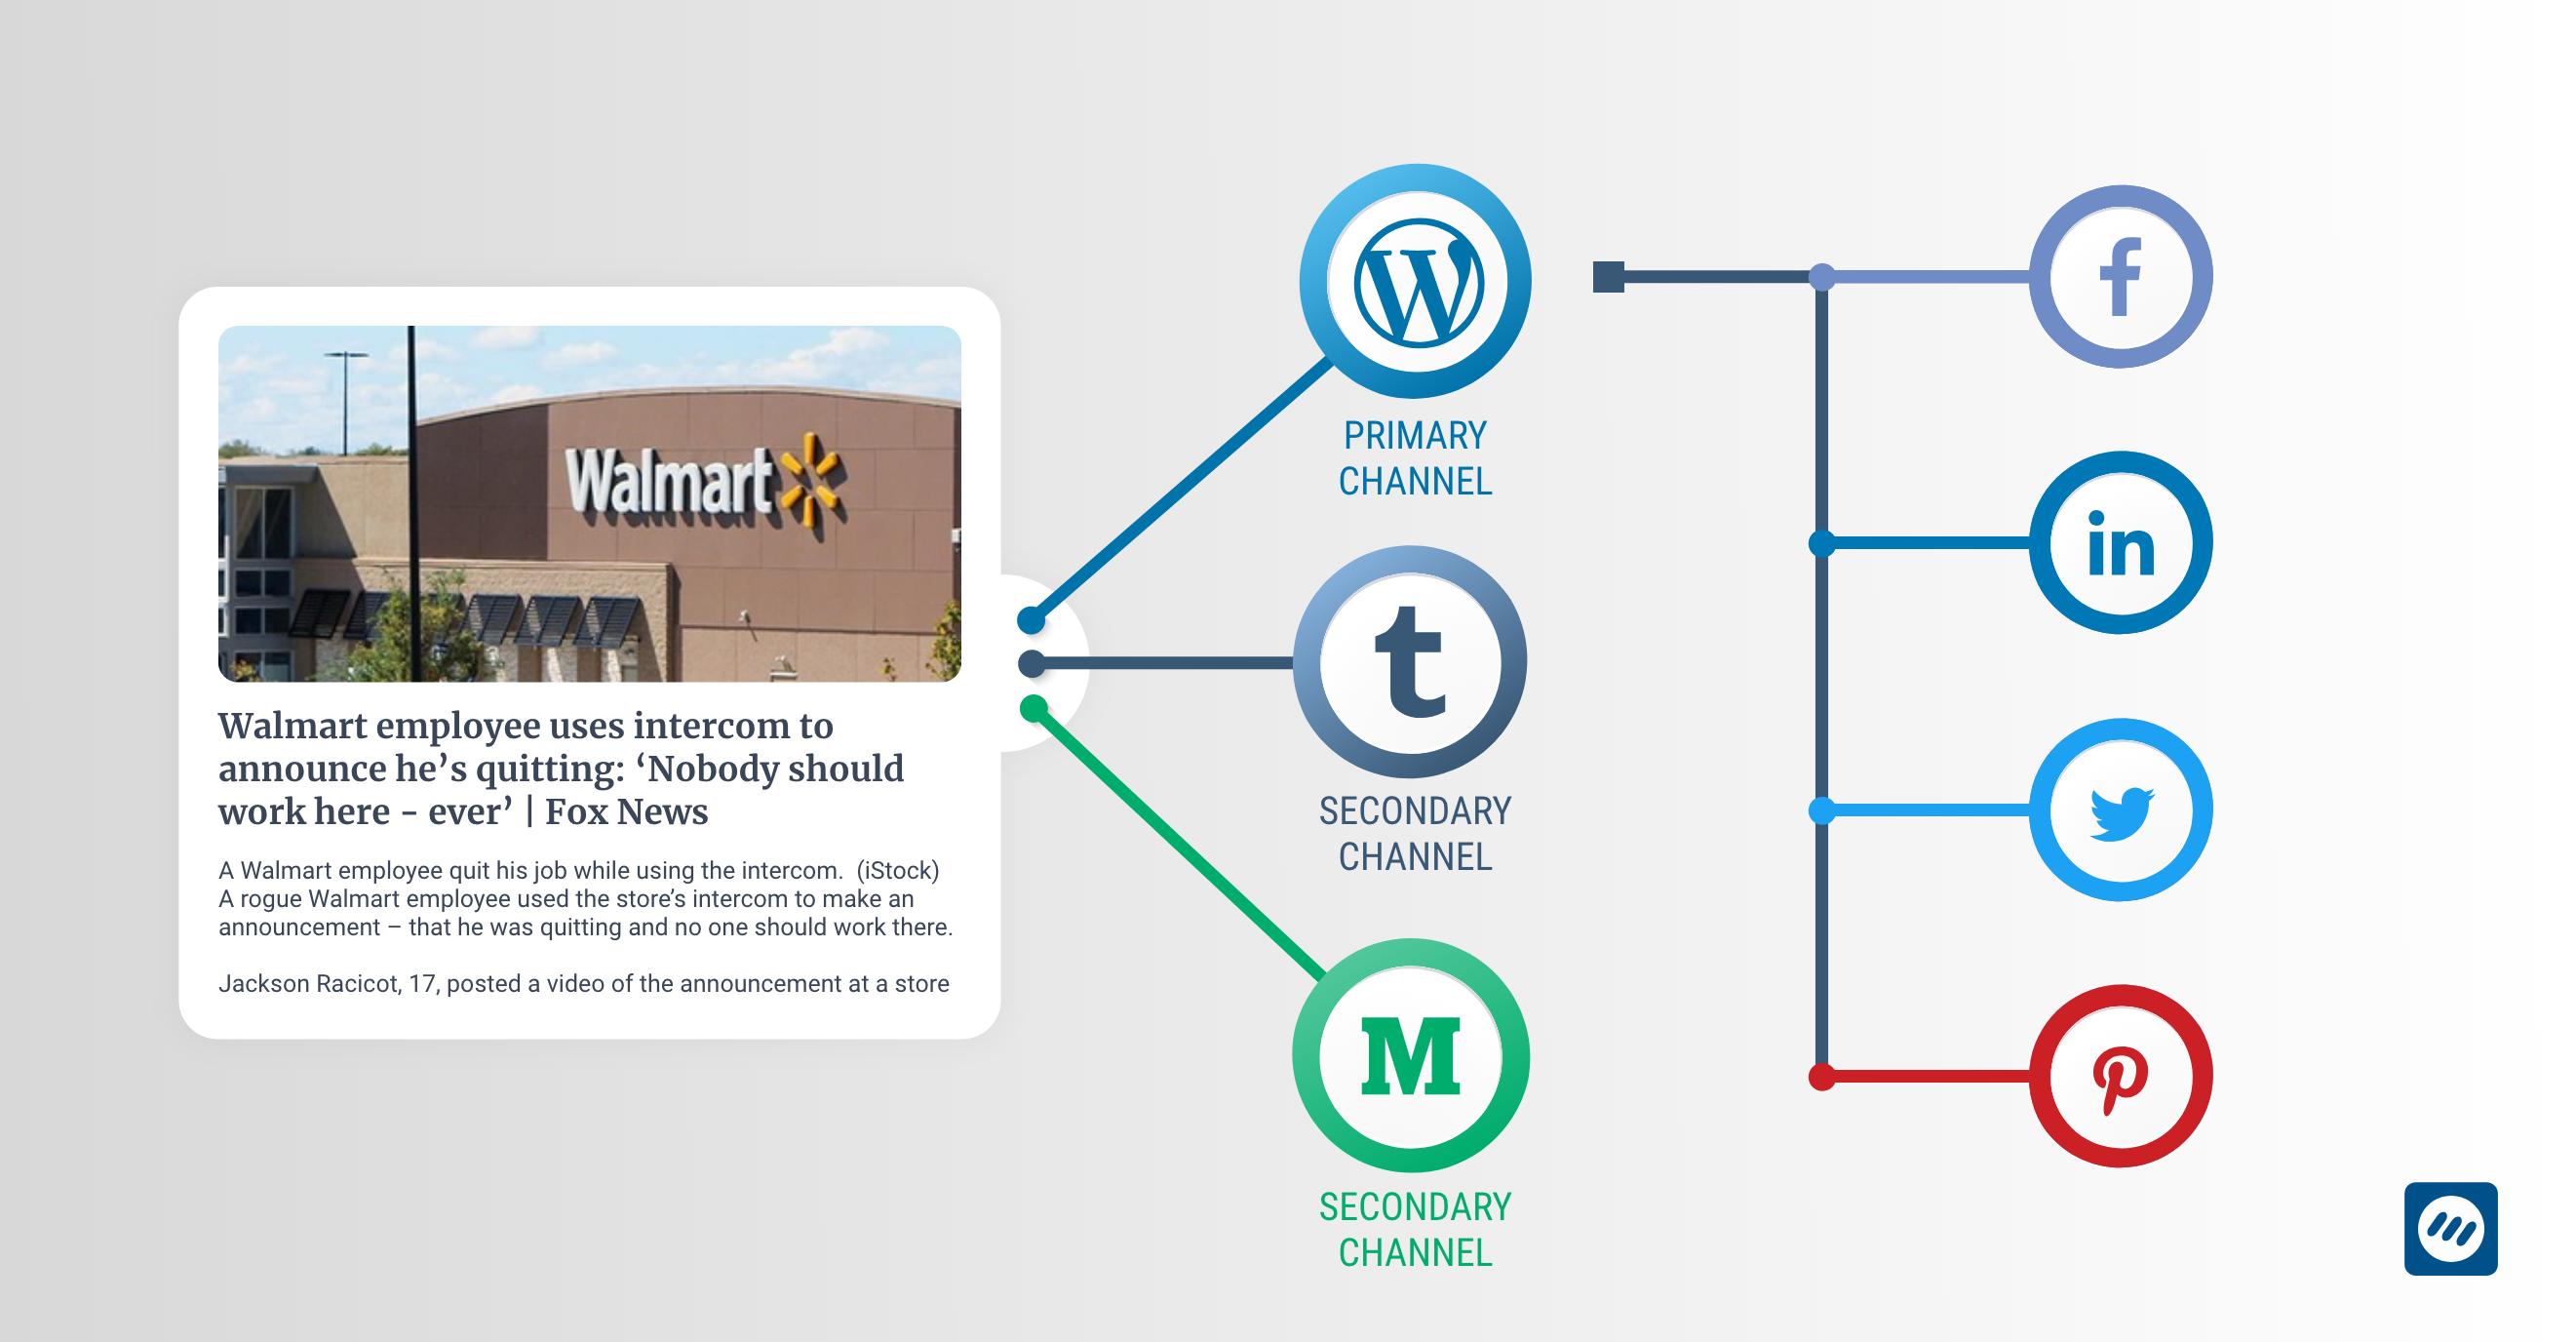 Article links to blogs - ContentStudio